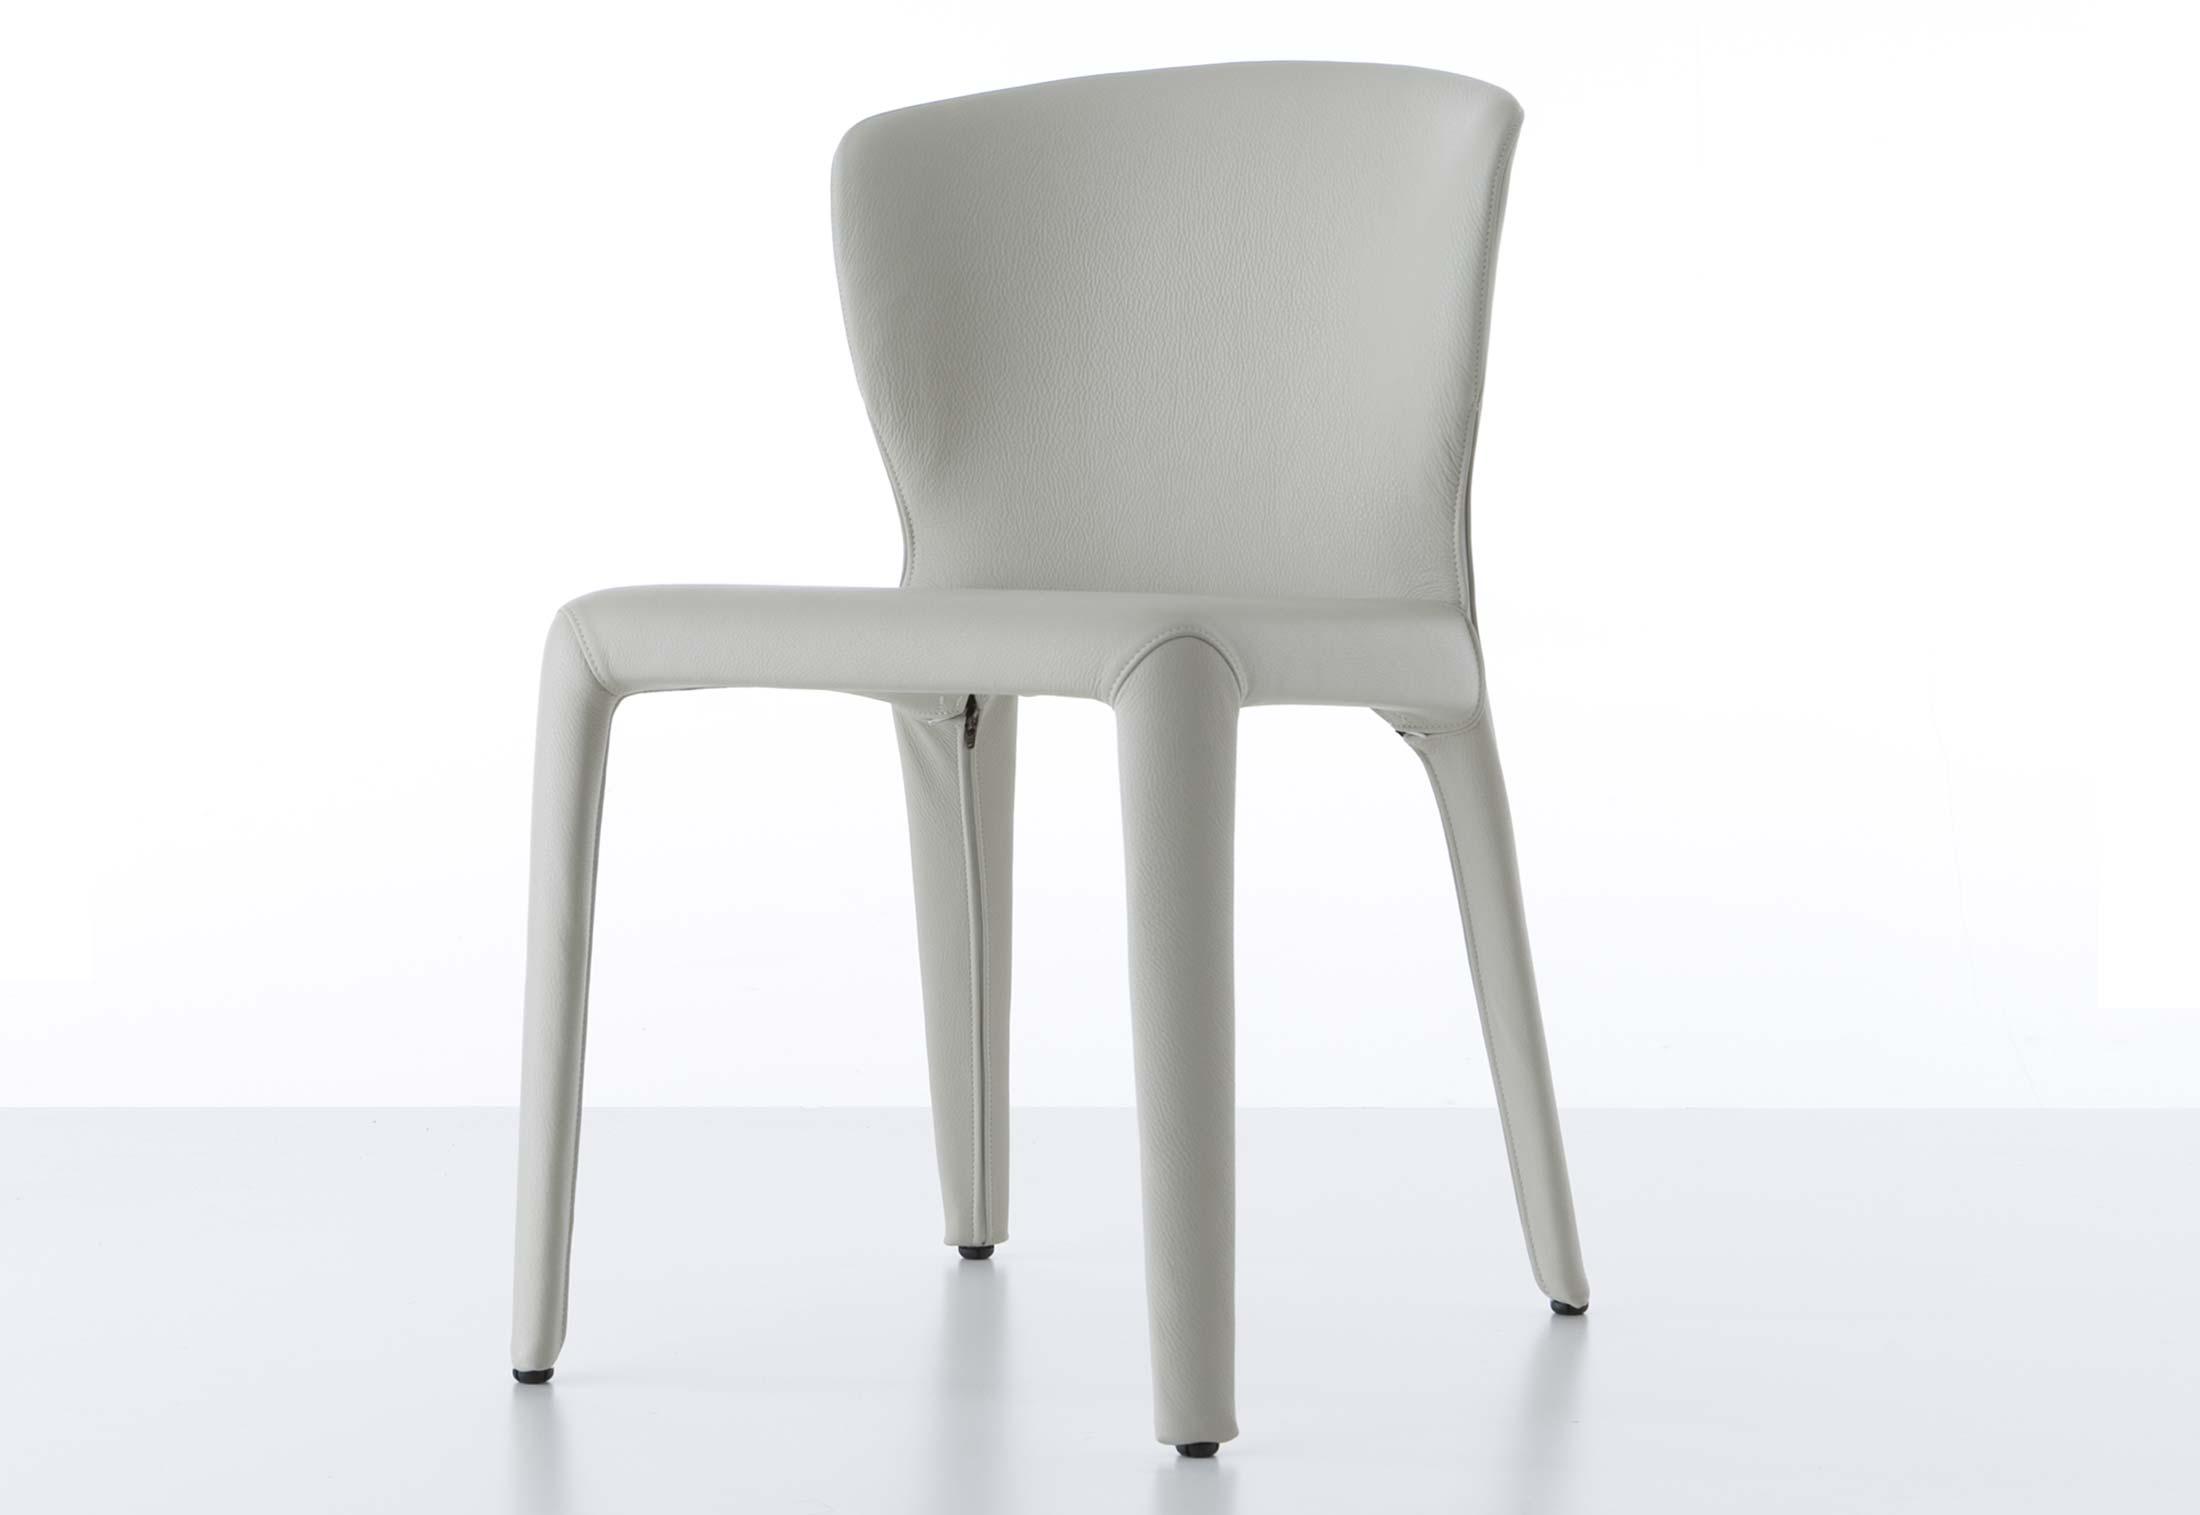 Hola sprint di cassina sedie poltroncine arredamento for Cassina sedie